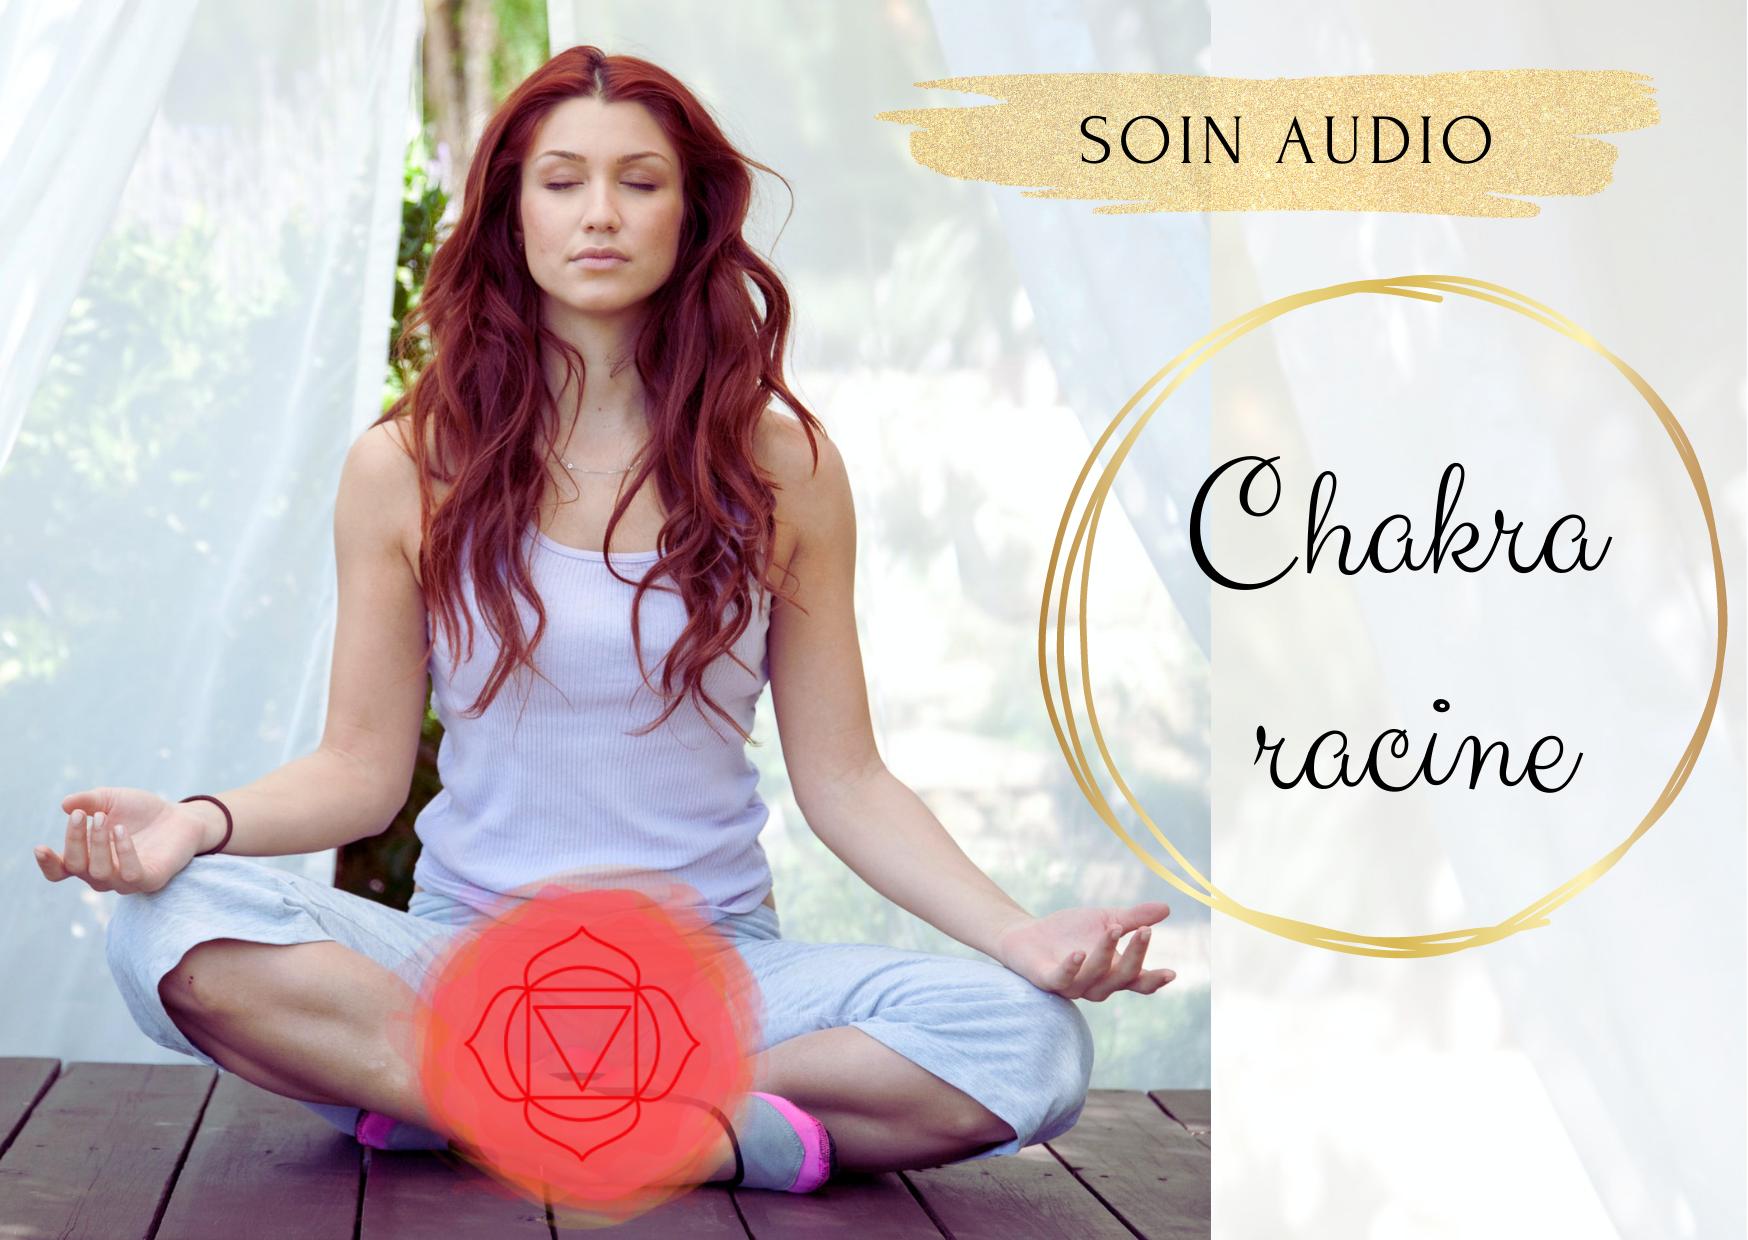 soin audio chakra racine